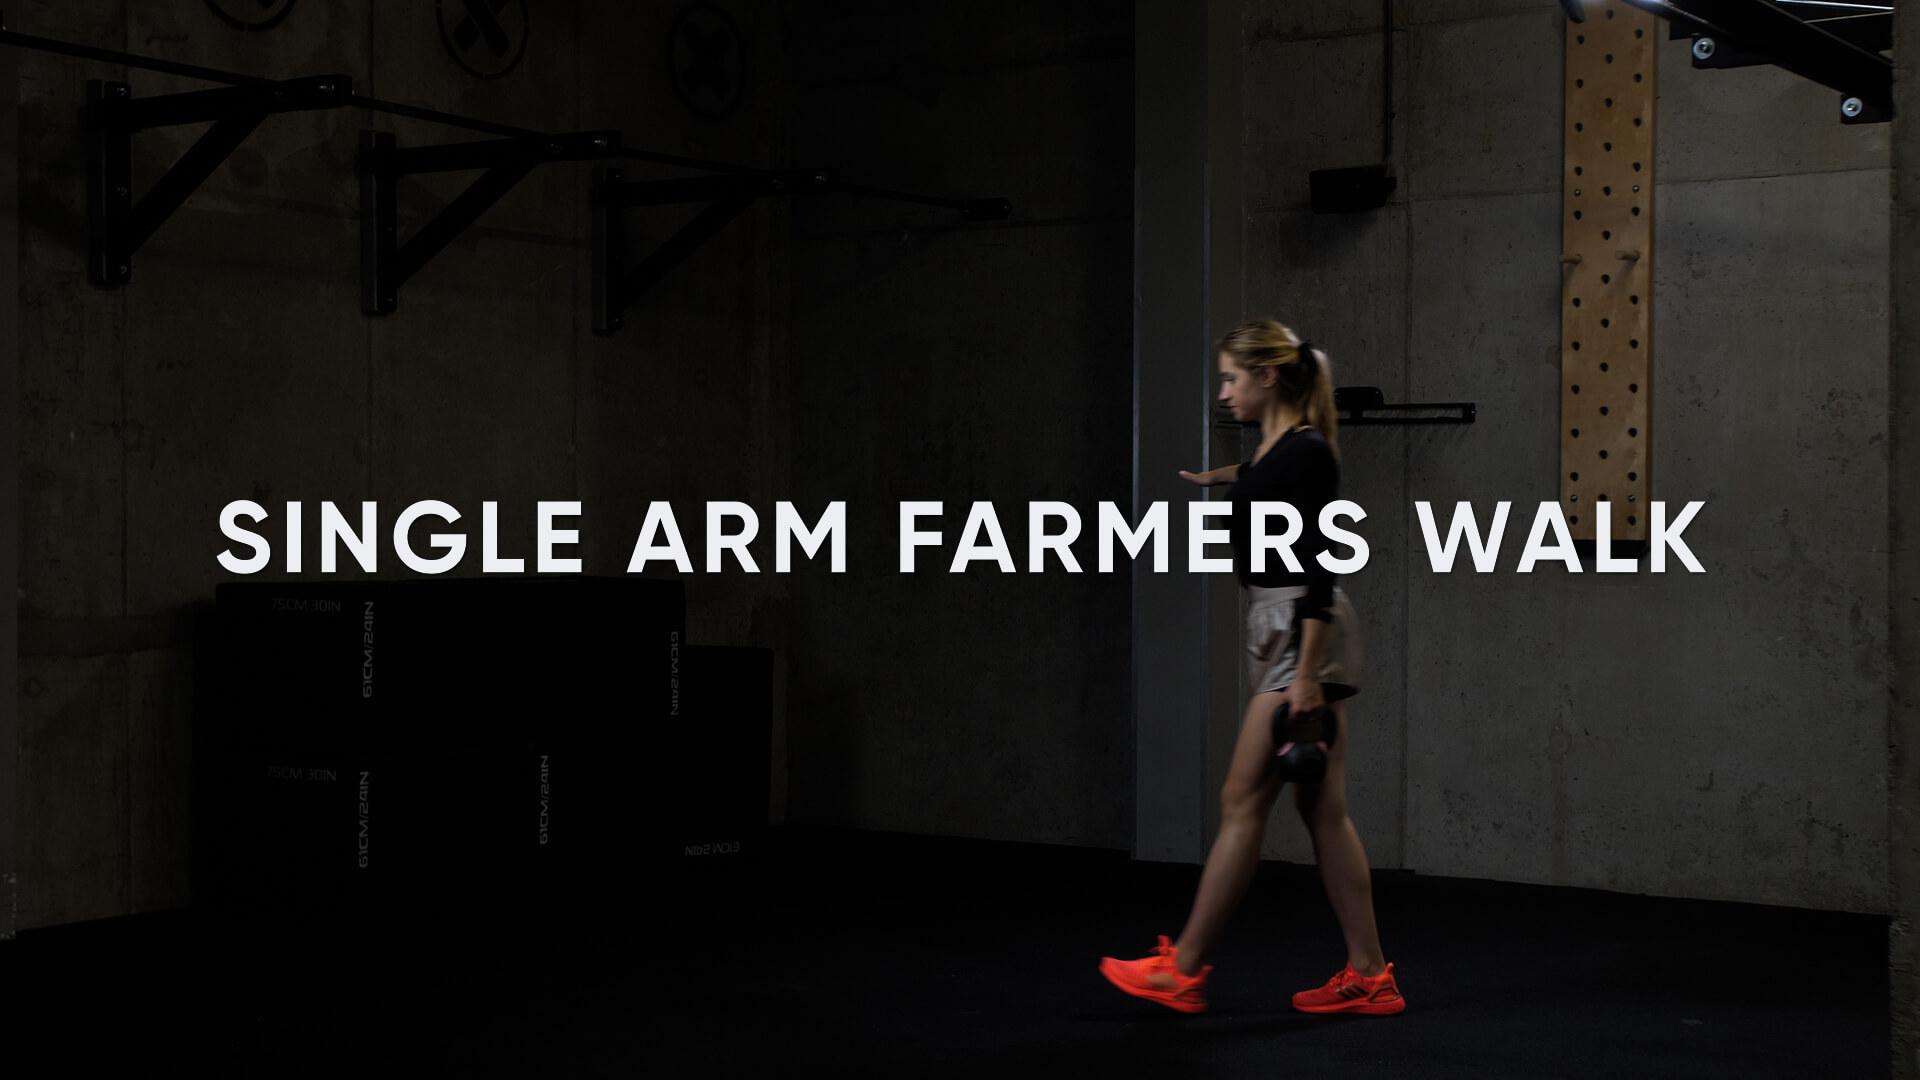 Single Arm Farmers Walk